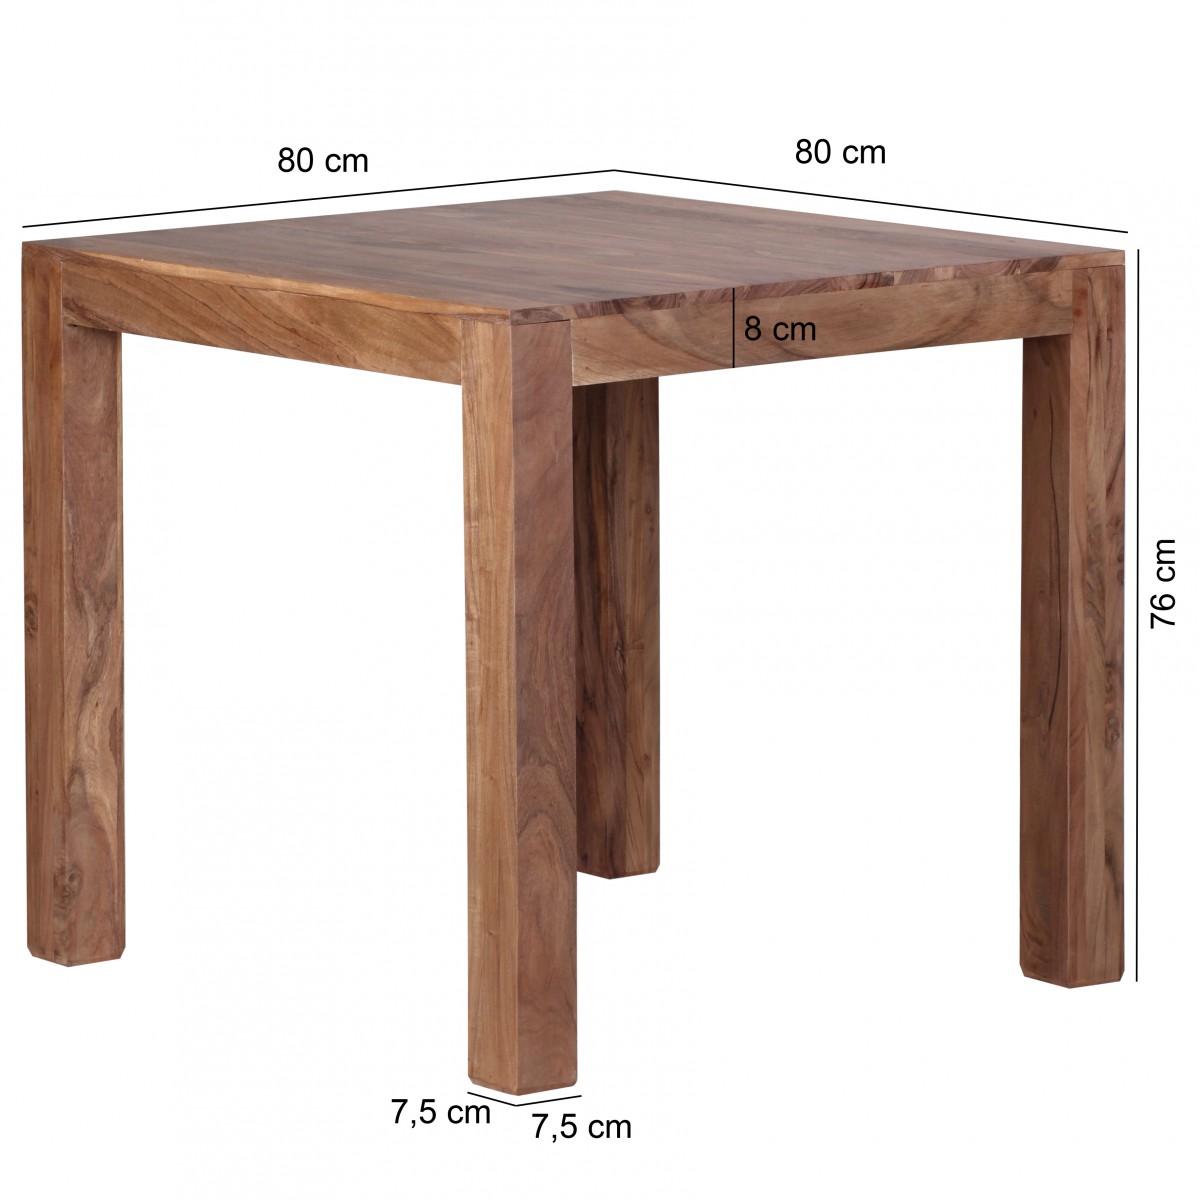 Wohnling design tavolo da pranzo quadrato 80 x 80 cm di for Design esstisch x7